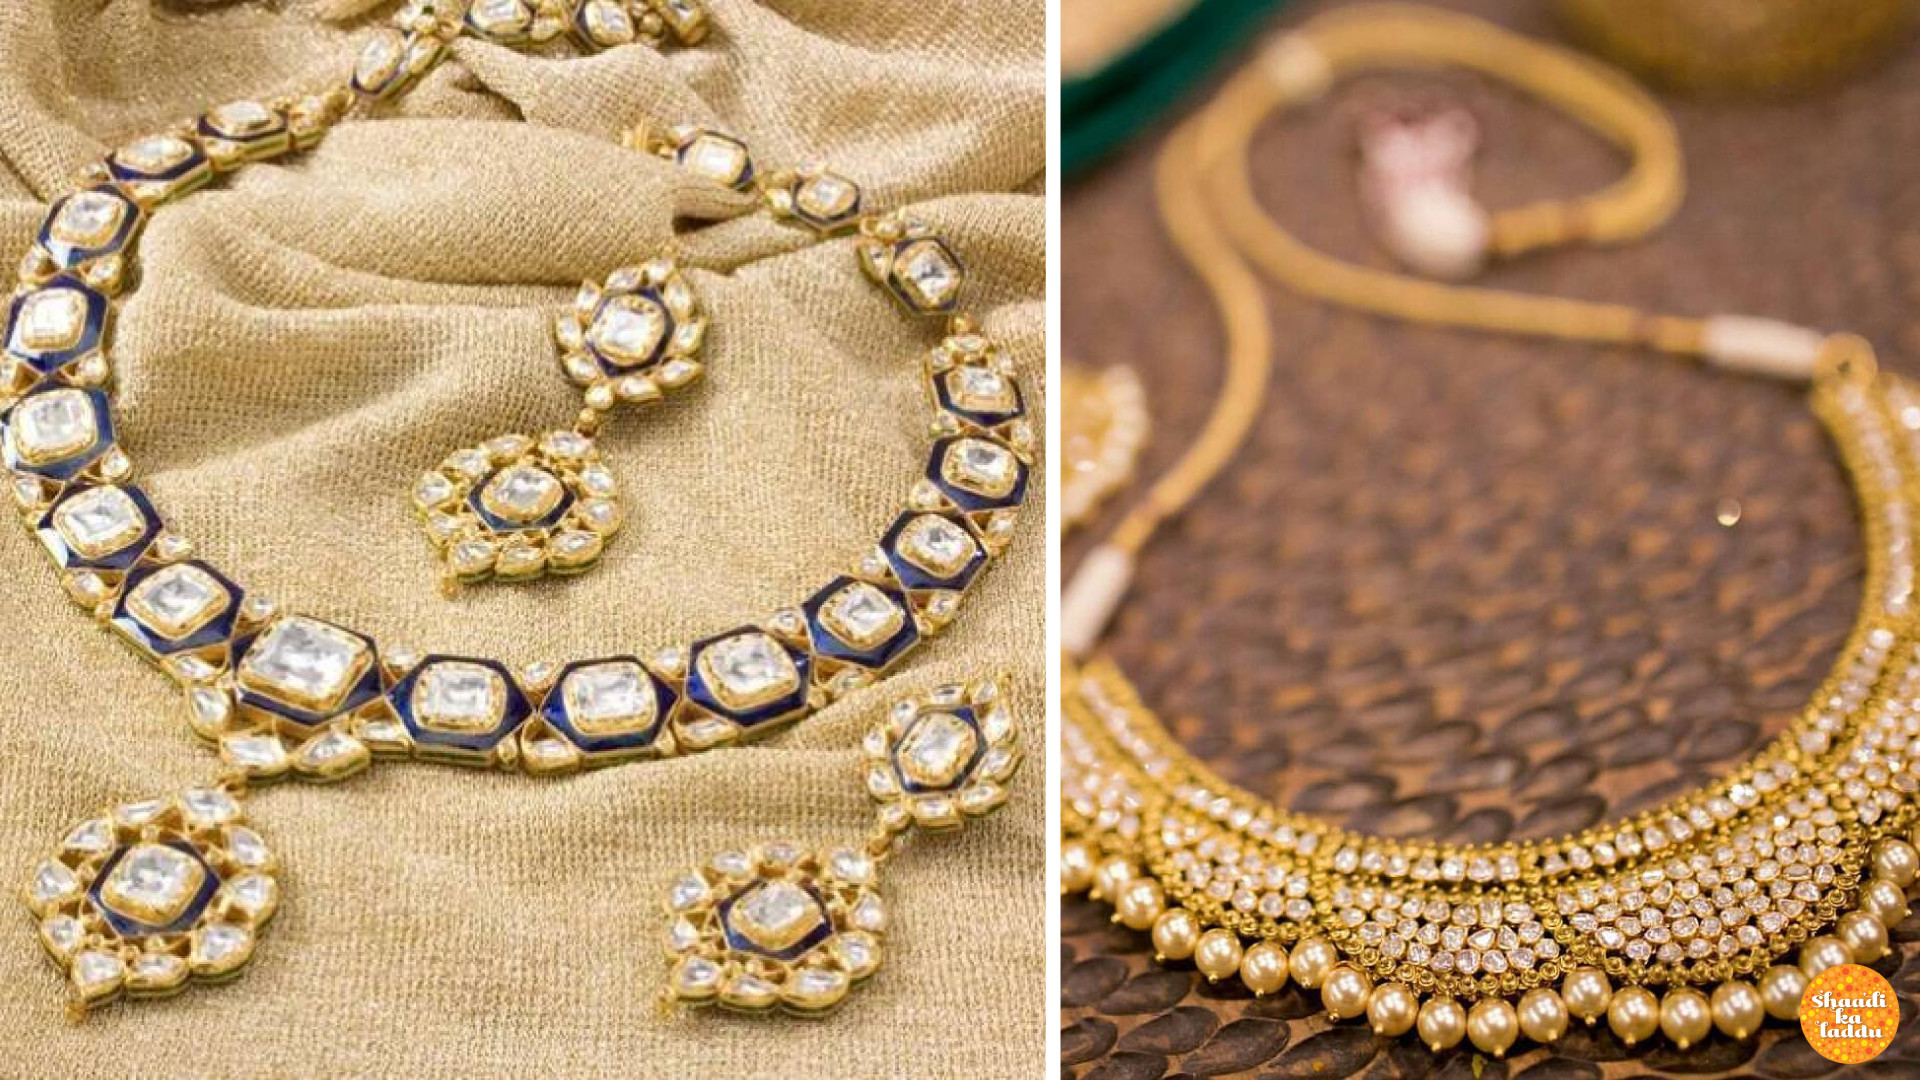 Precious stone studded meenakari work in different designer chokers